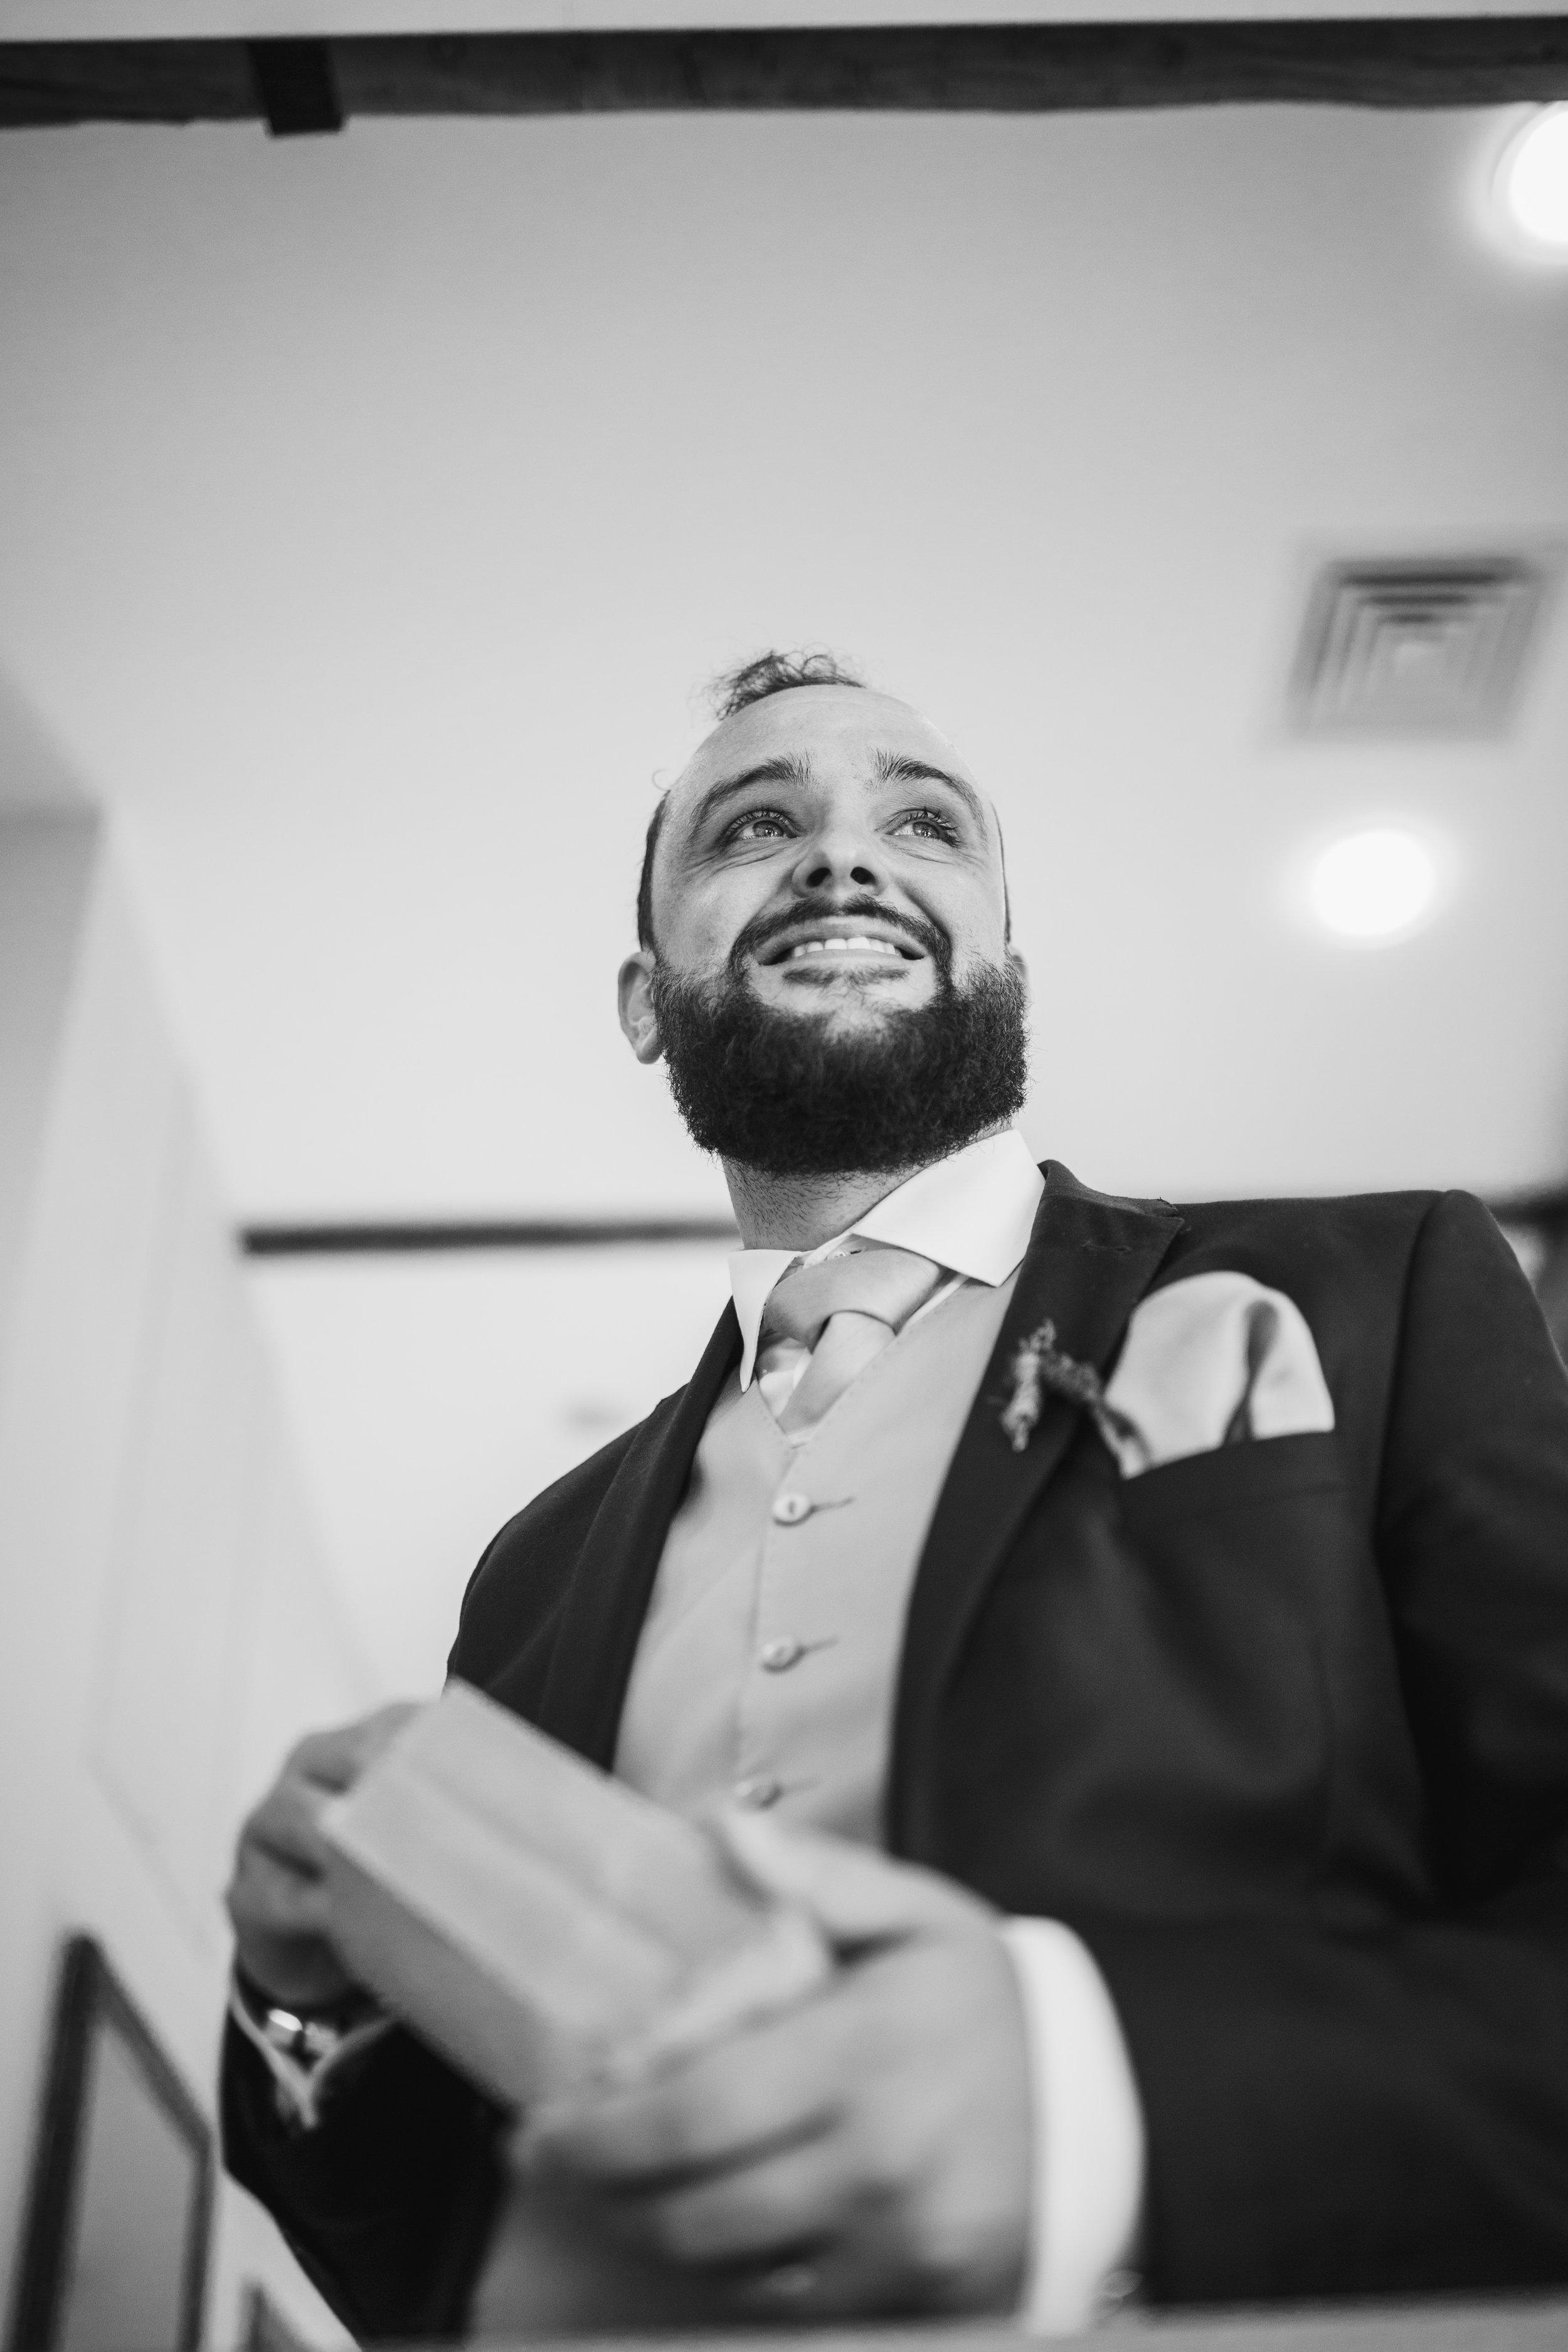 THOMAS WEDDING-152507.jpg